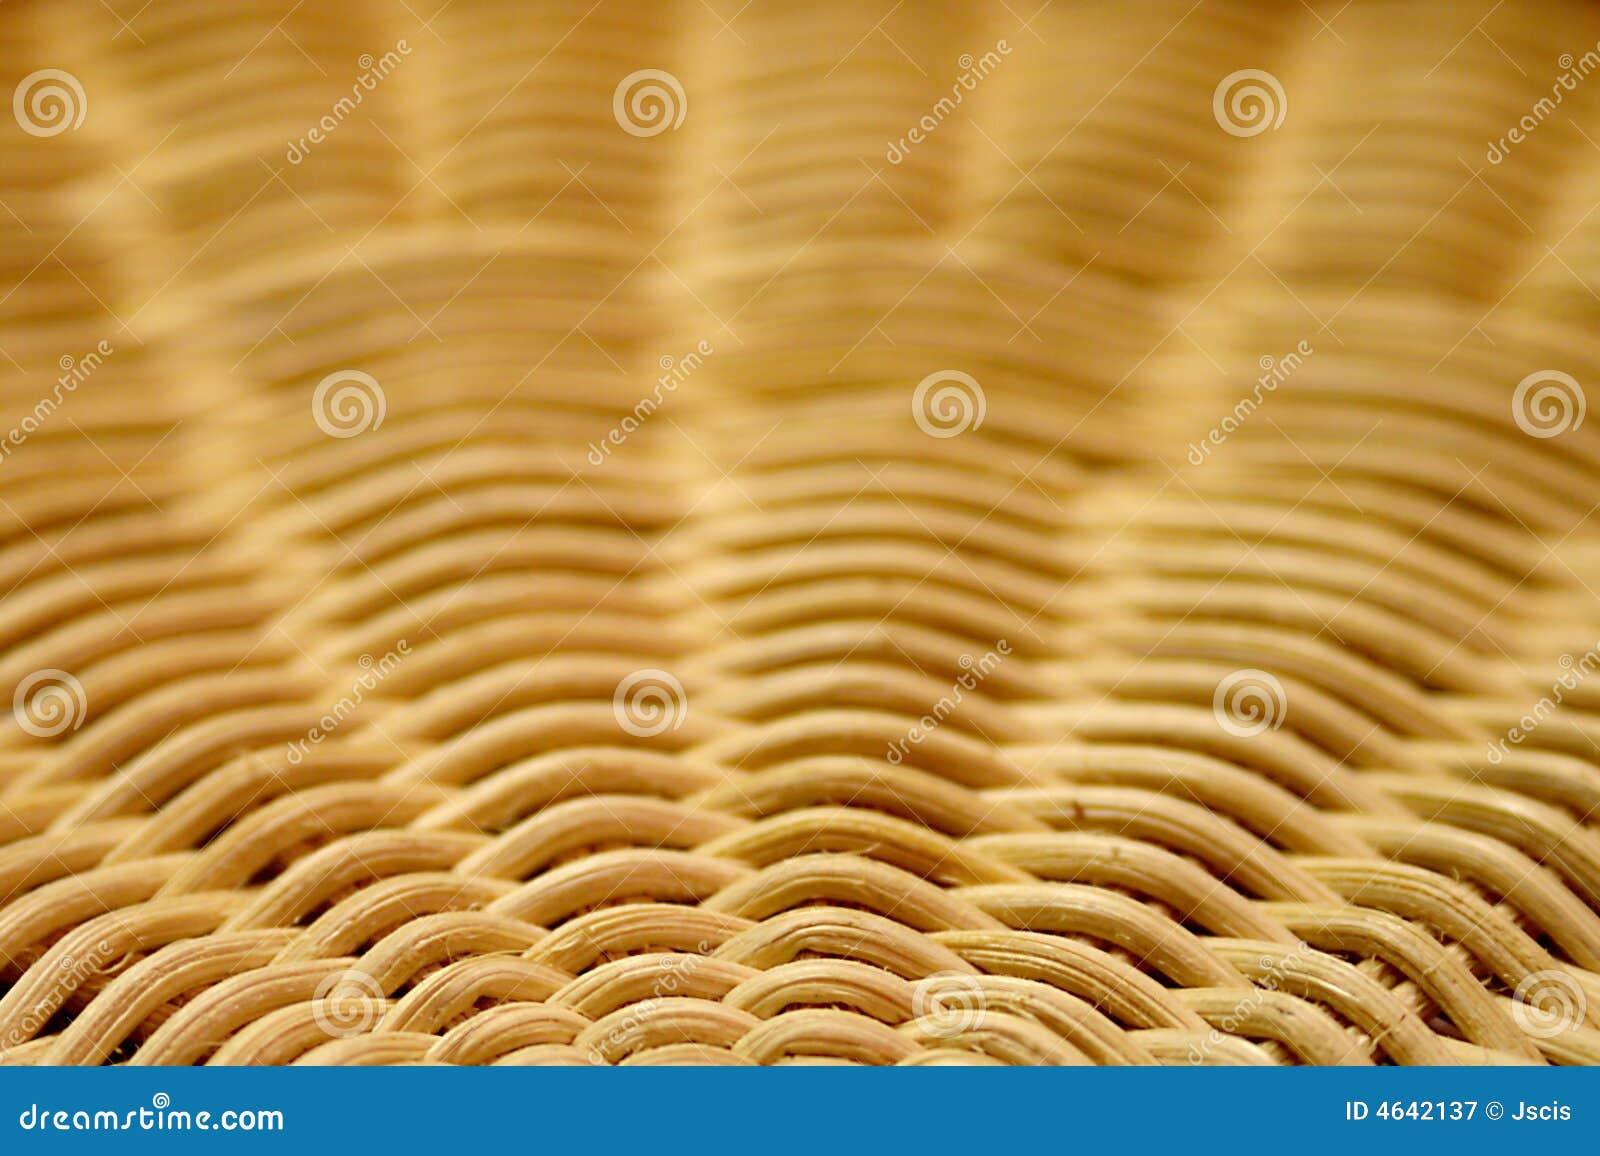 Basket Weaving Round Reed : Round reed basket pattern royalty free stock photography